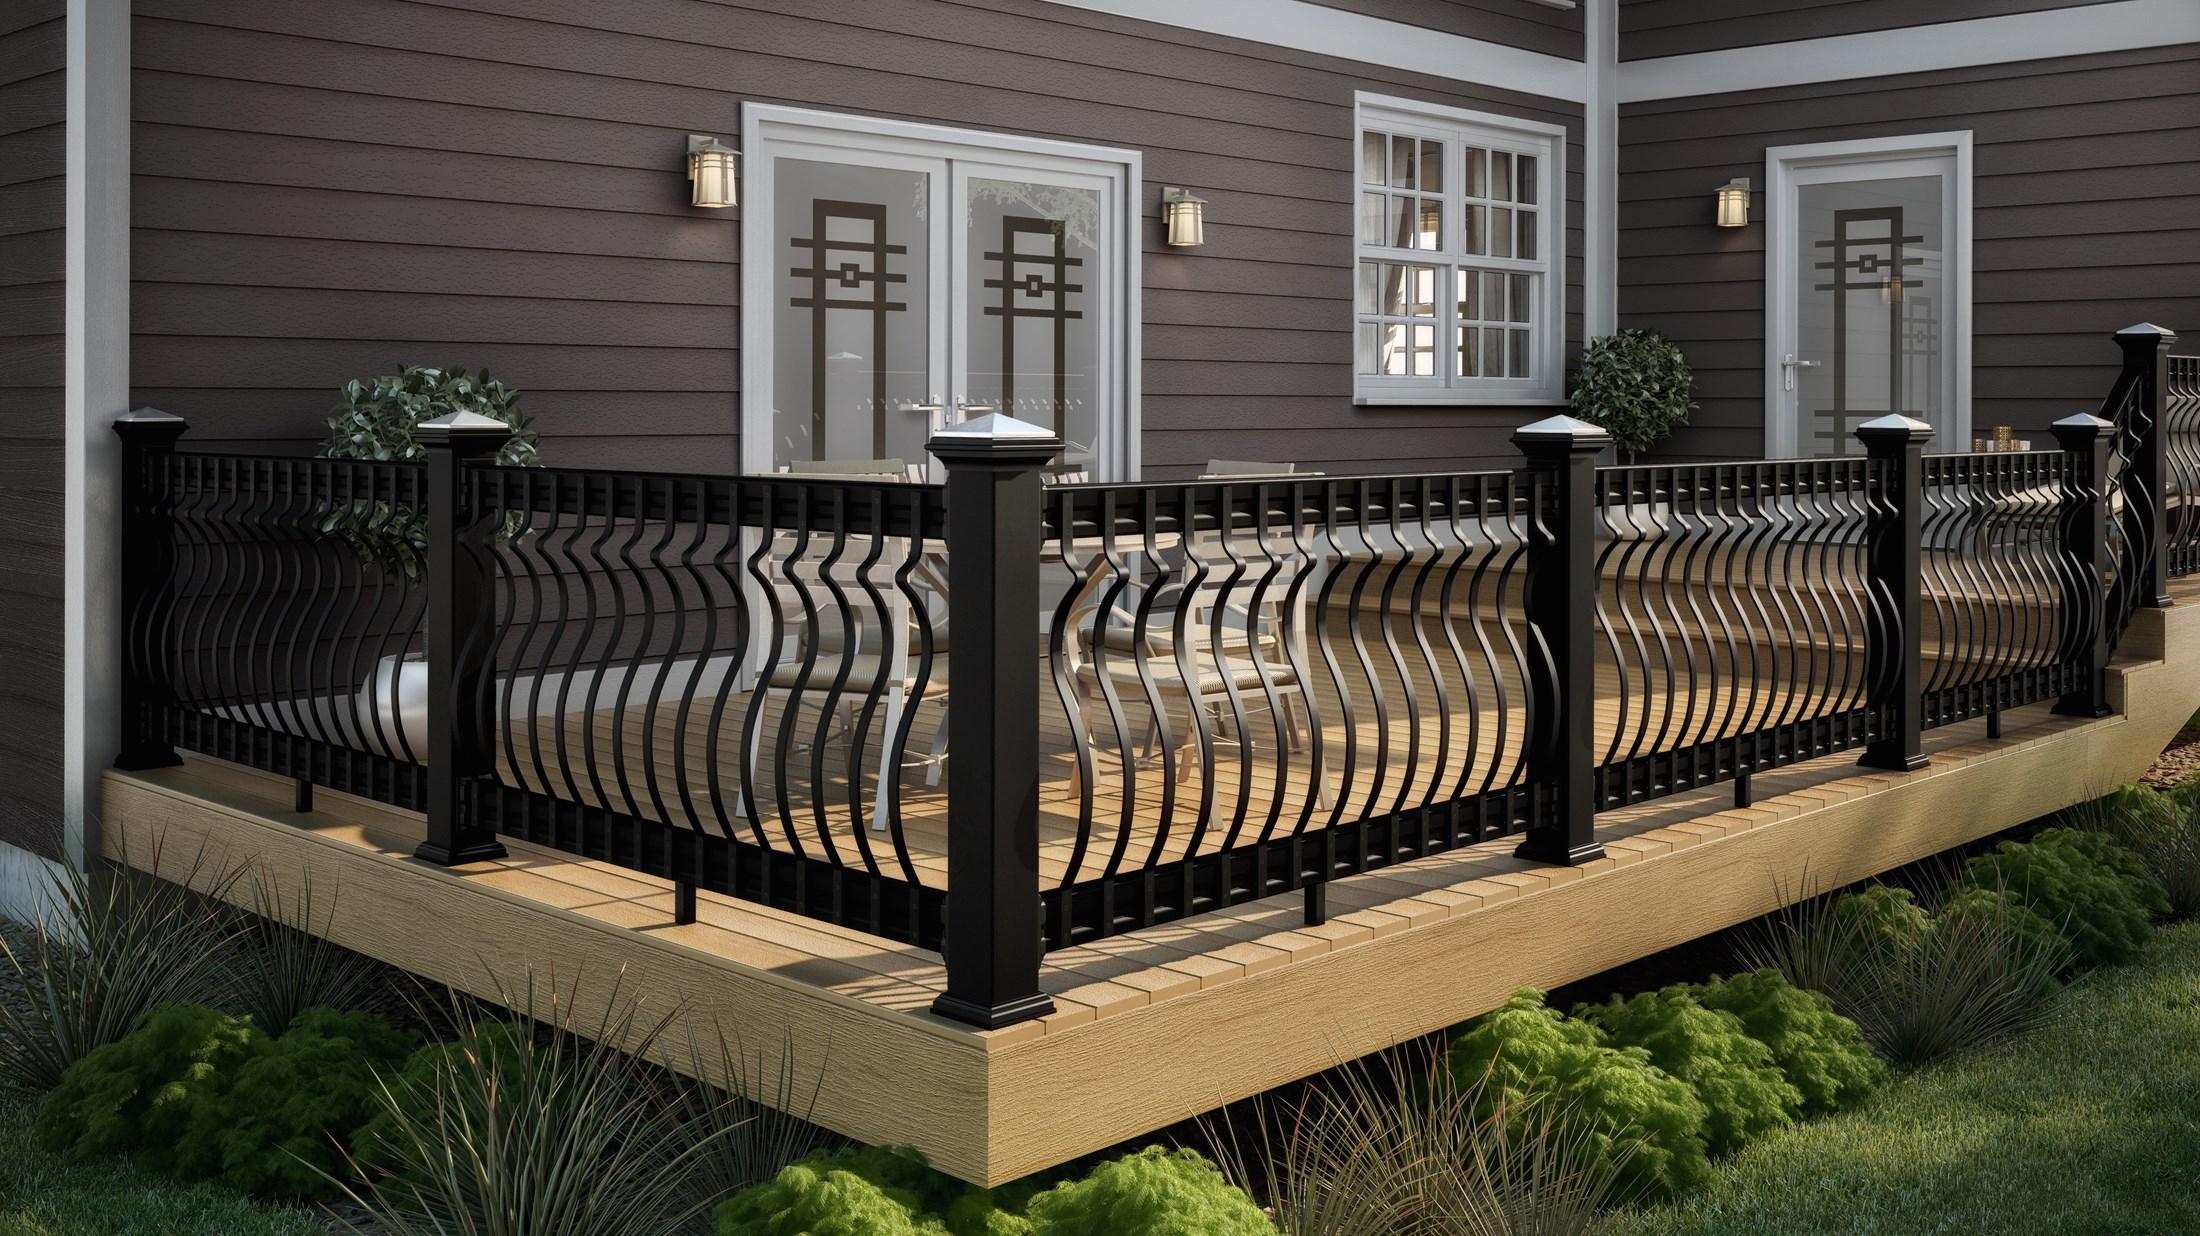 Black Rod Iron Deck Railing Decks Ideas